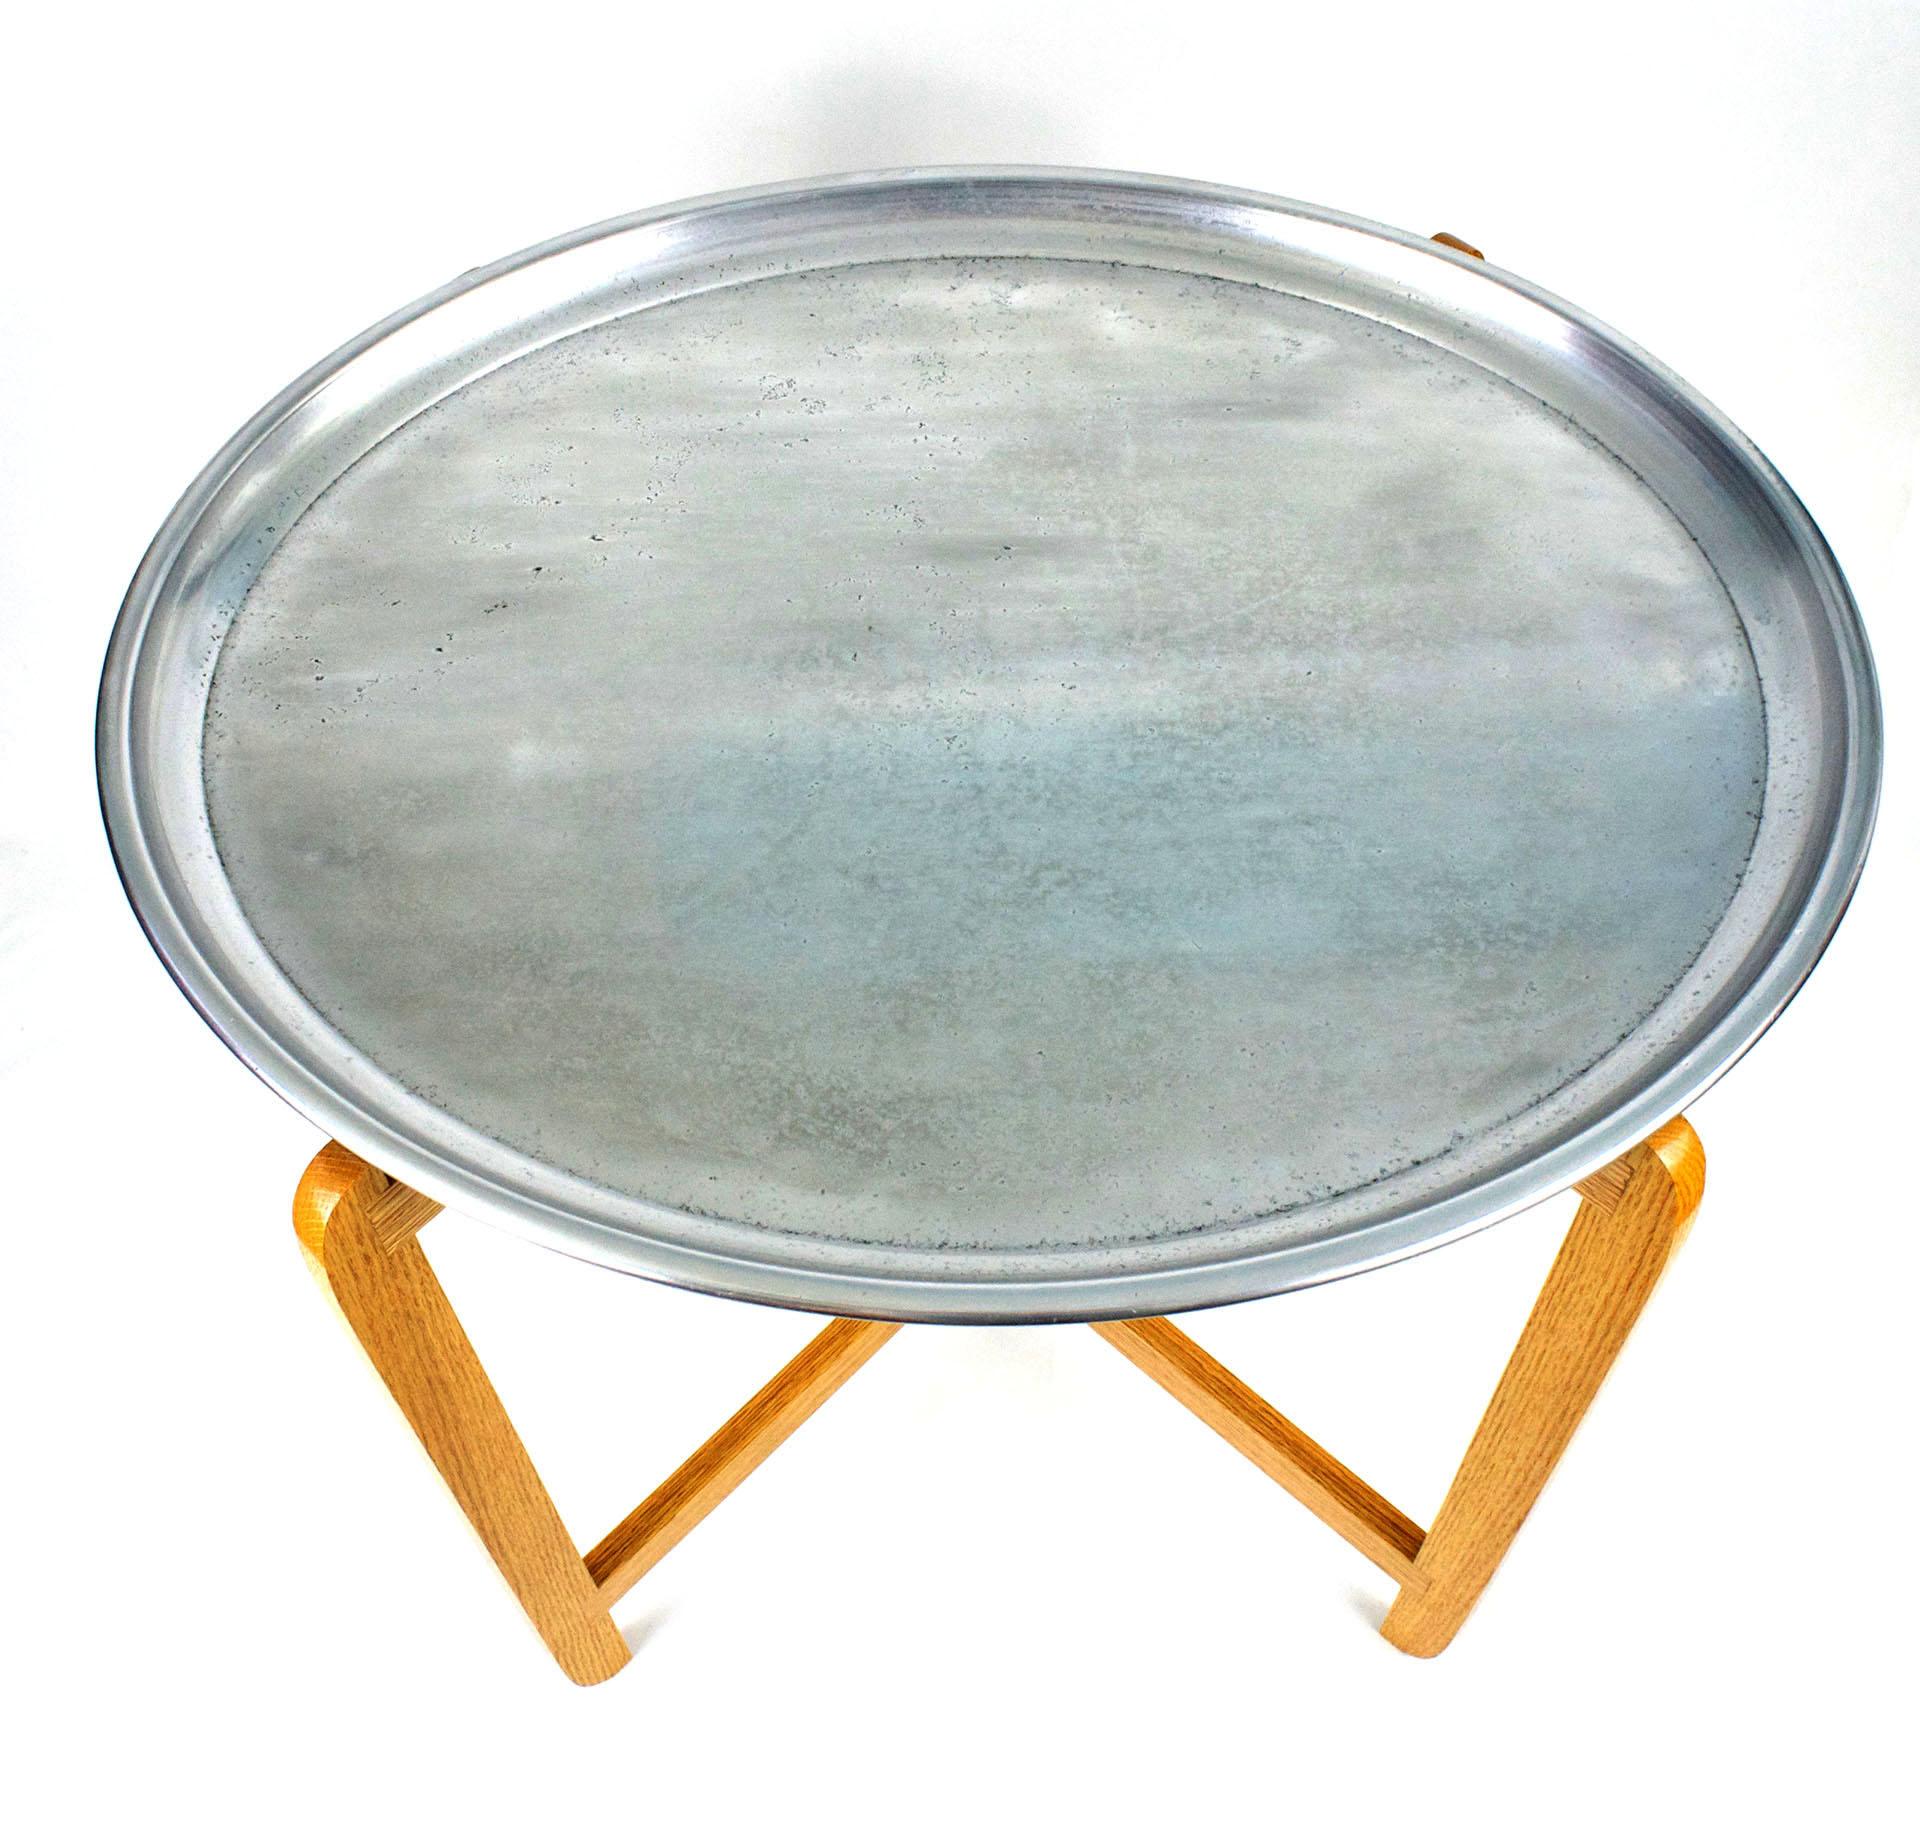 Alum tray table 3.jpg